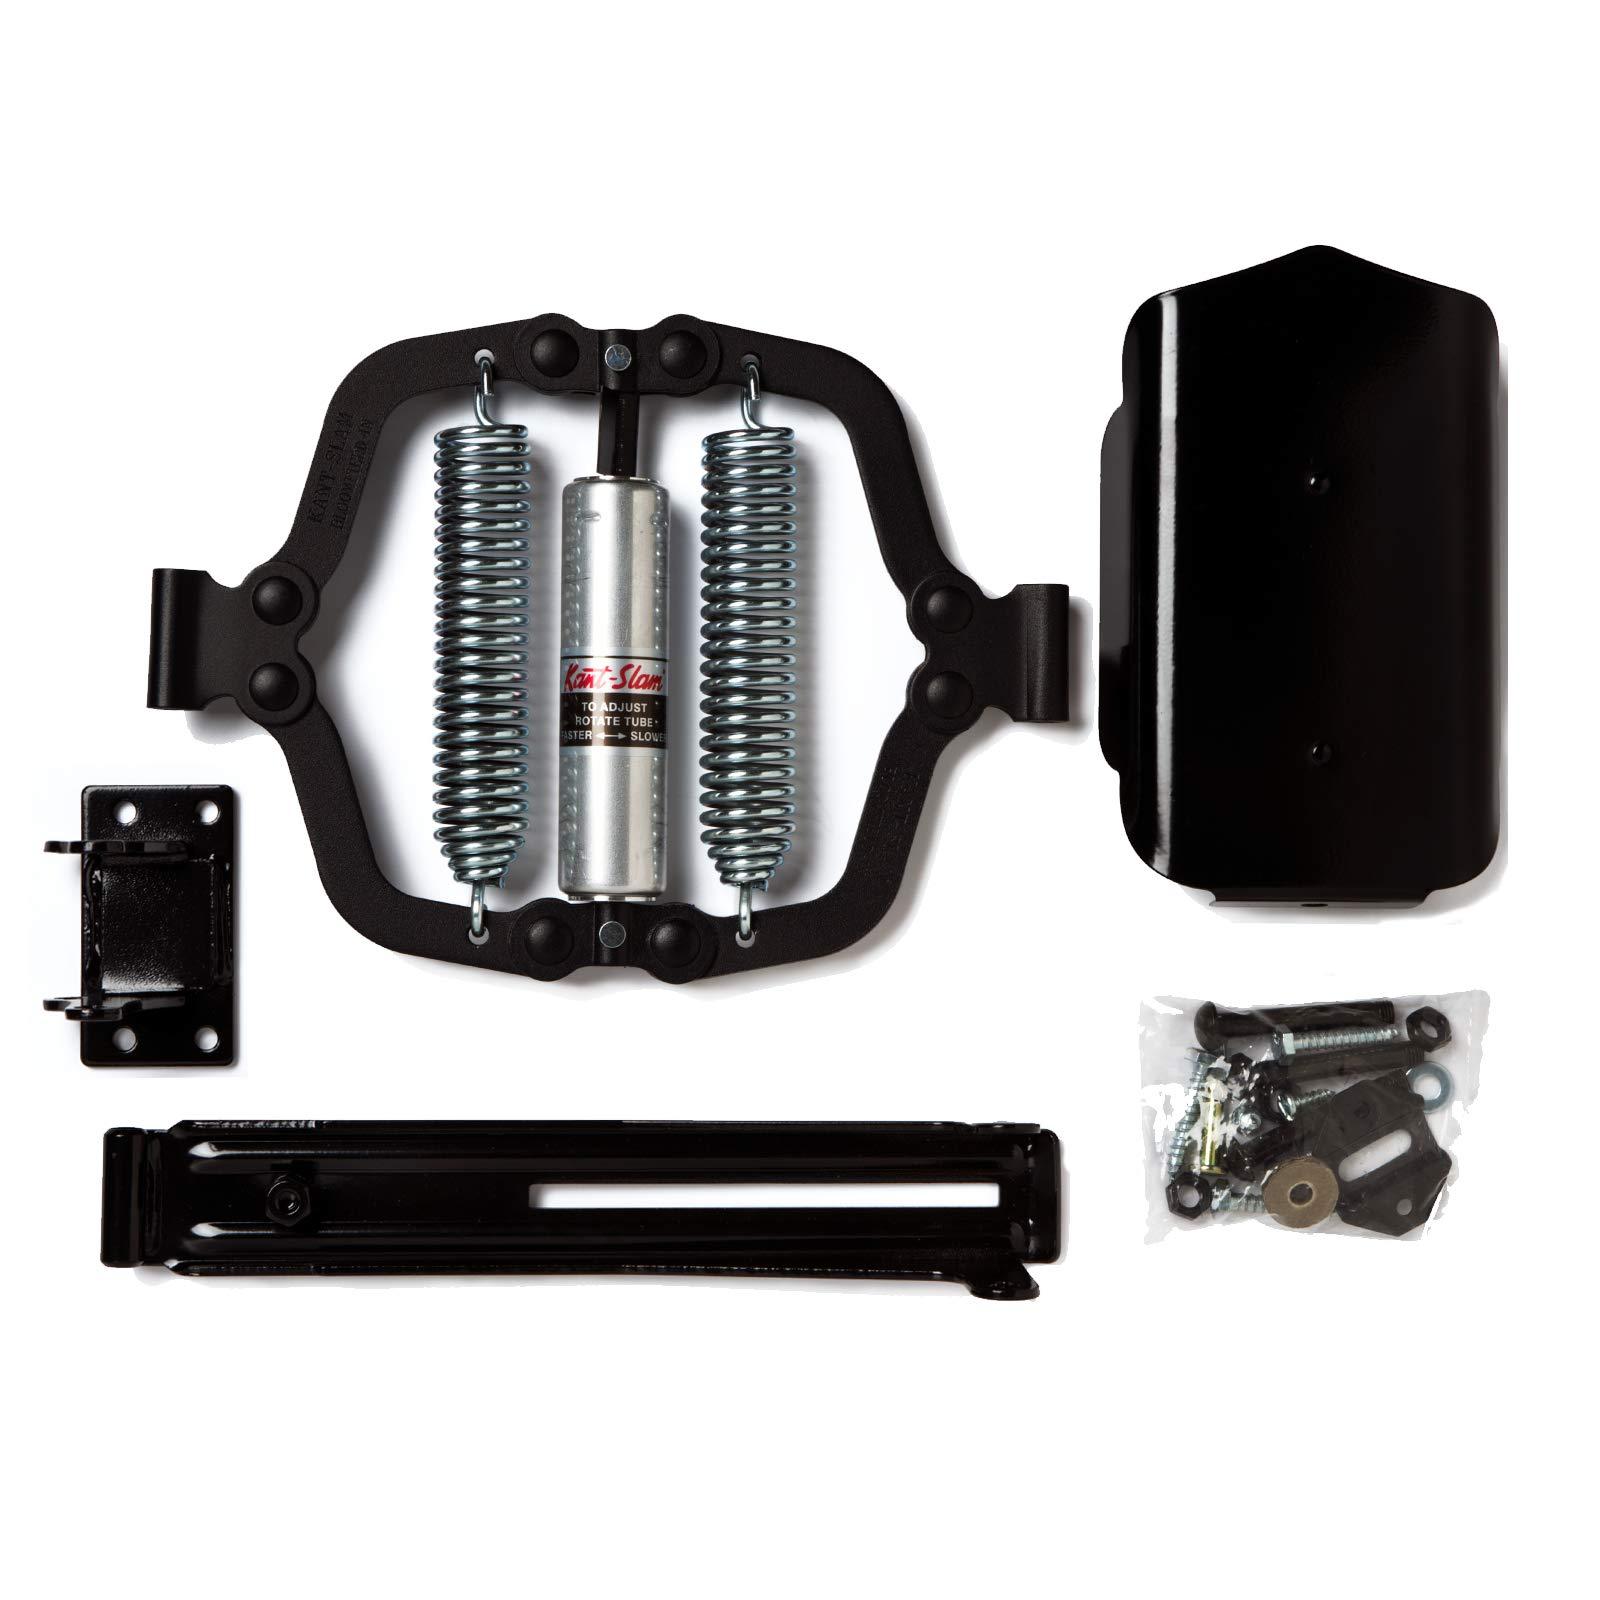 Hi-Lift KS-950 Kant-Slam Hydraulic Gate Closer, Black